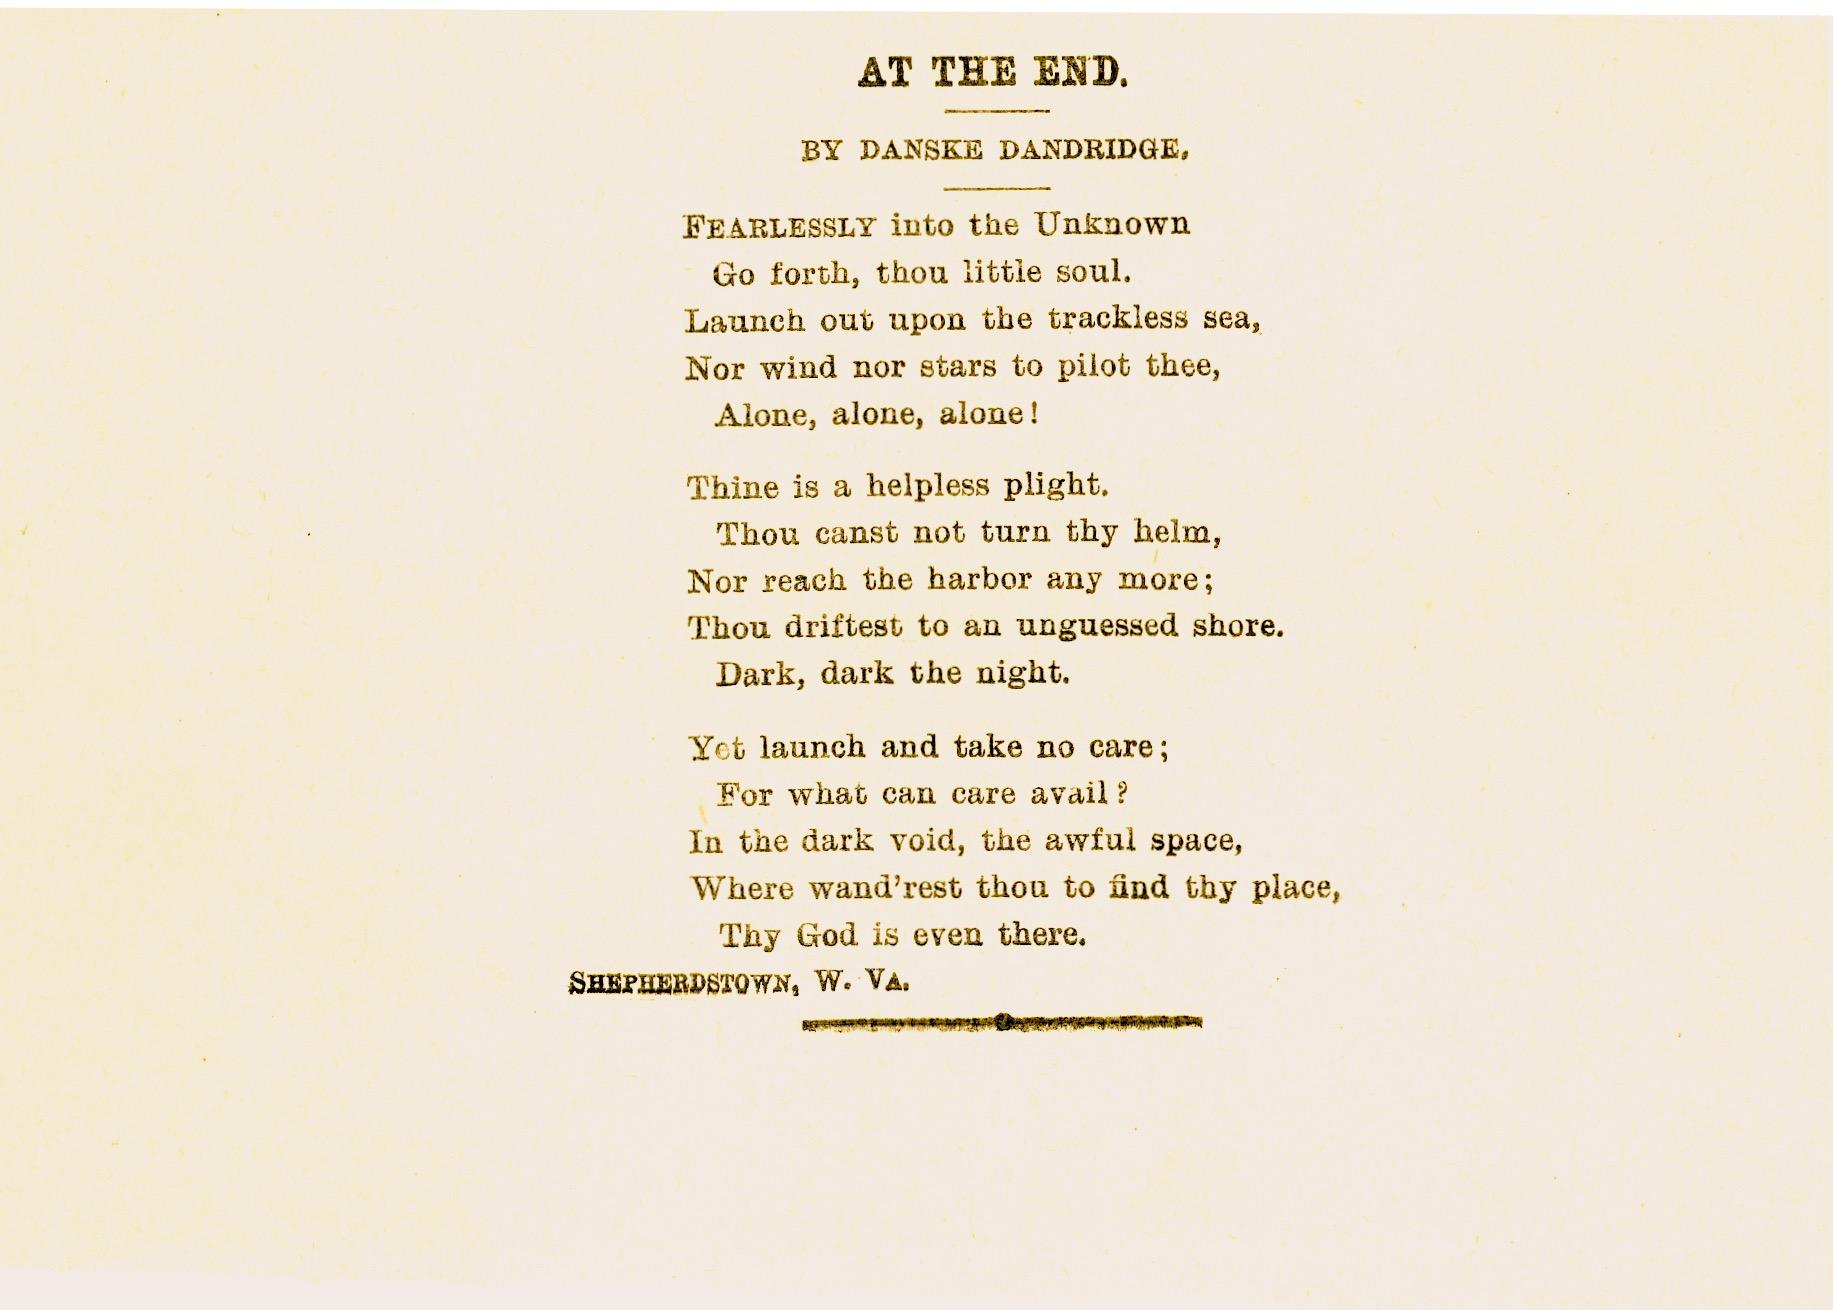 Danske Dandridge poem, At the End.